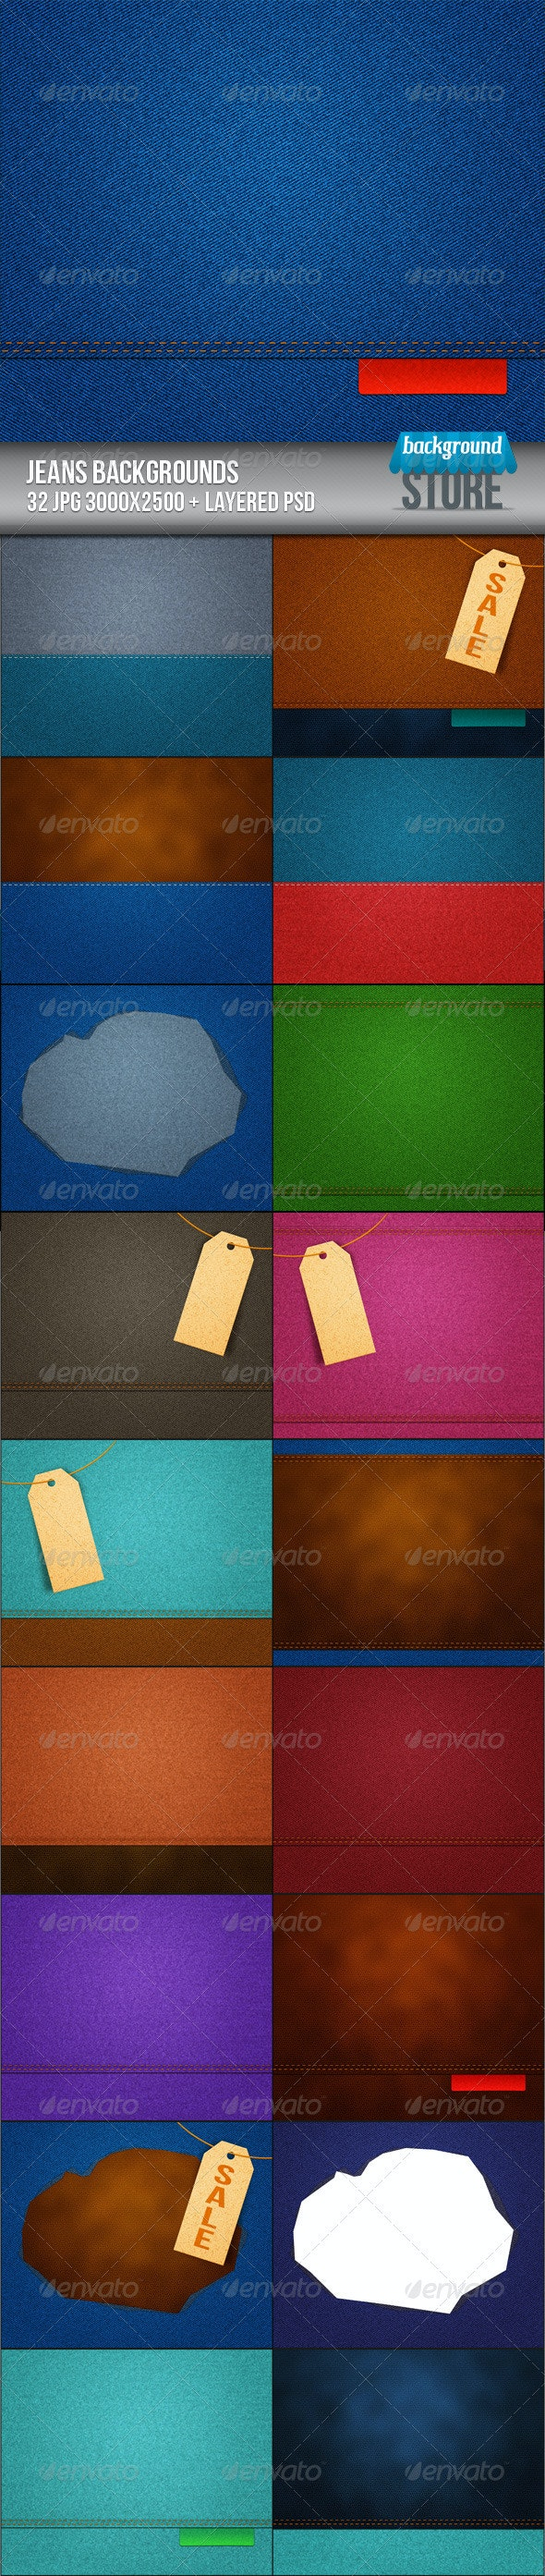 Jeans Backgrounds Texture - Miscellaneous Backgrounds